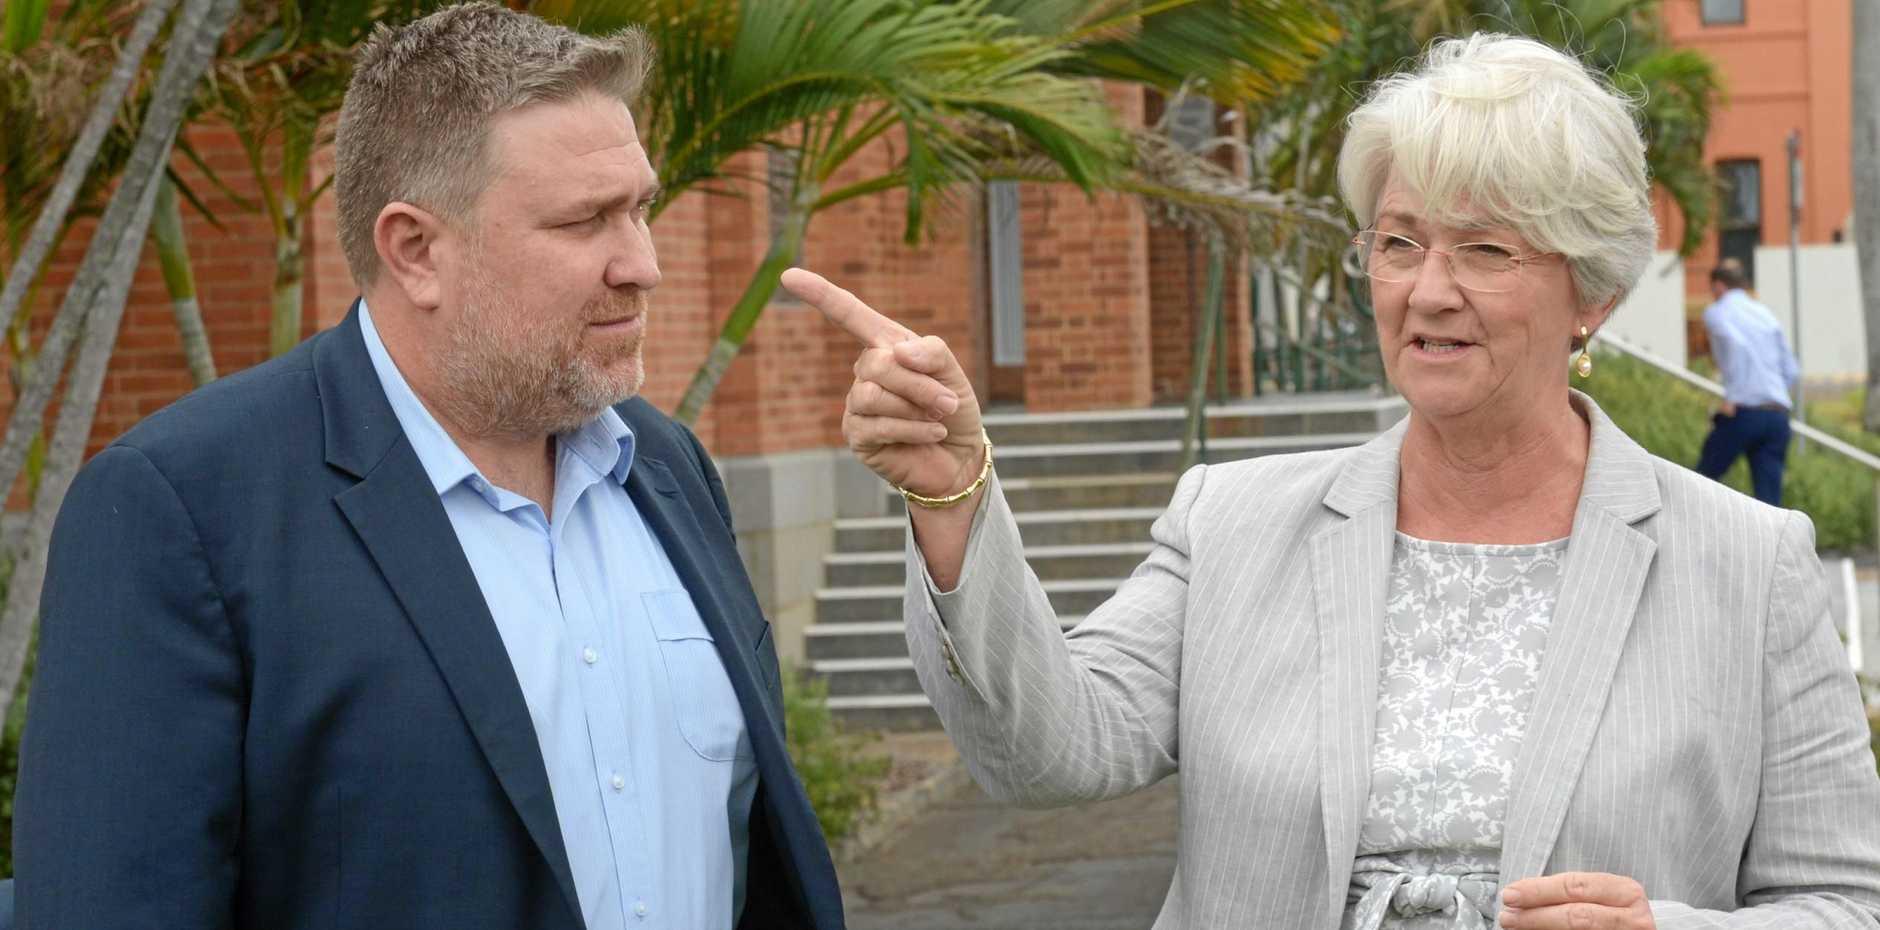 Adani Mining chief executive Lucas Dow and Rockhampton region mayor Margaret Strelow